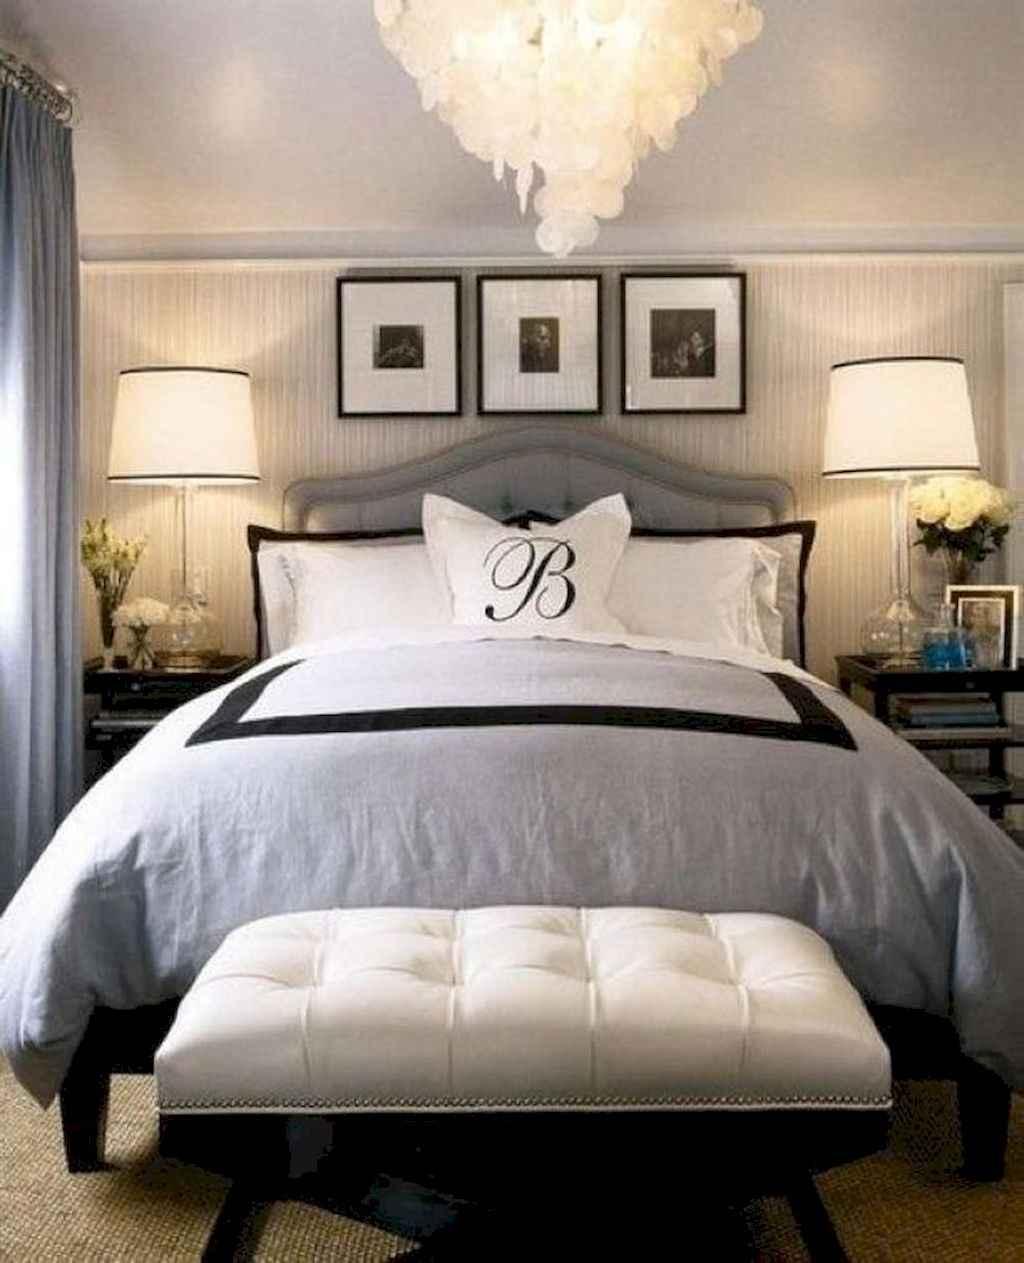 Incredible master bedroom ideas (26)